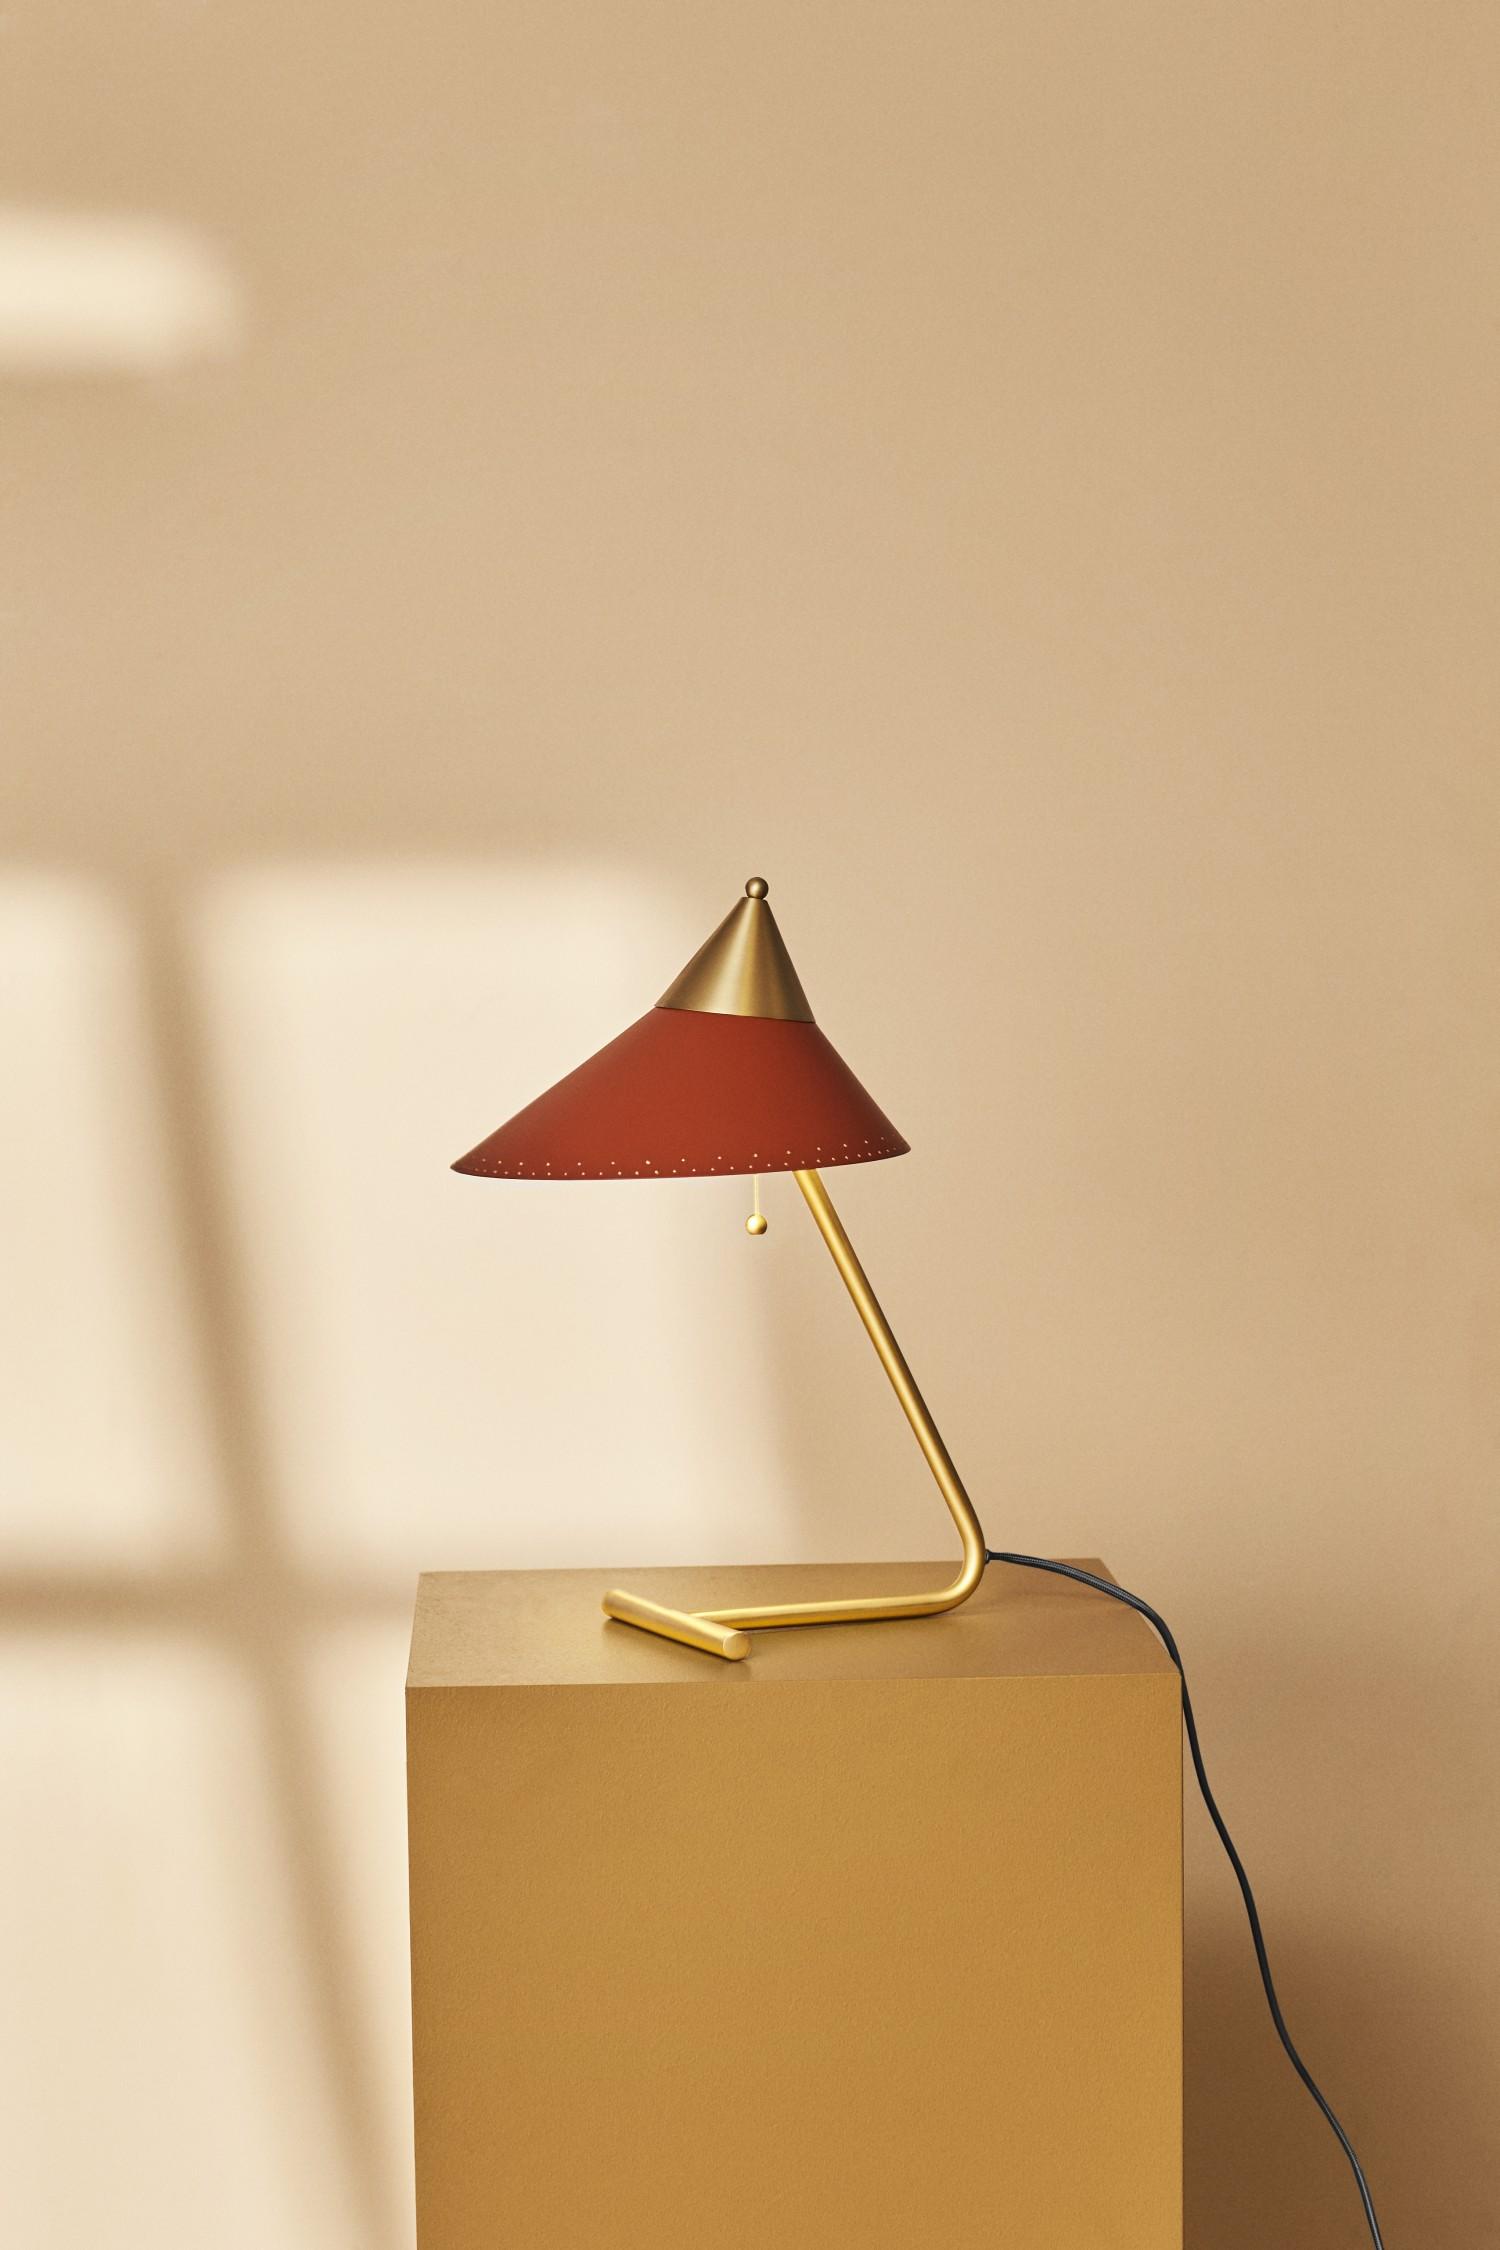 4210007-warmnordic-lighting-brasstop-tablelamp-rustyred-vyellow